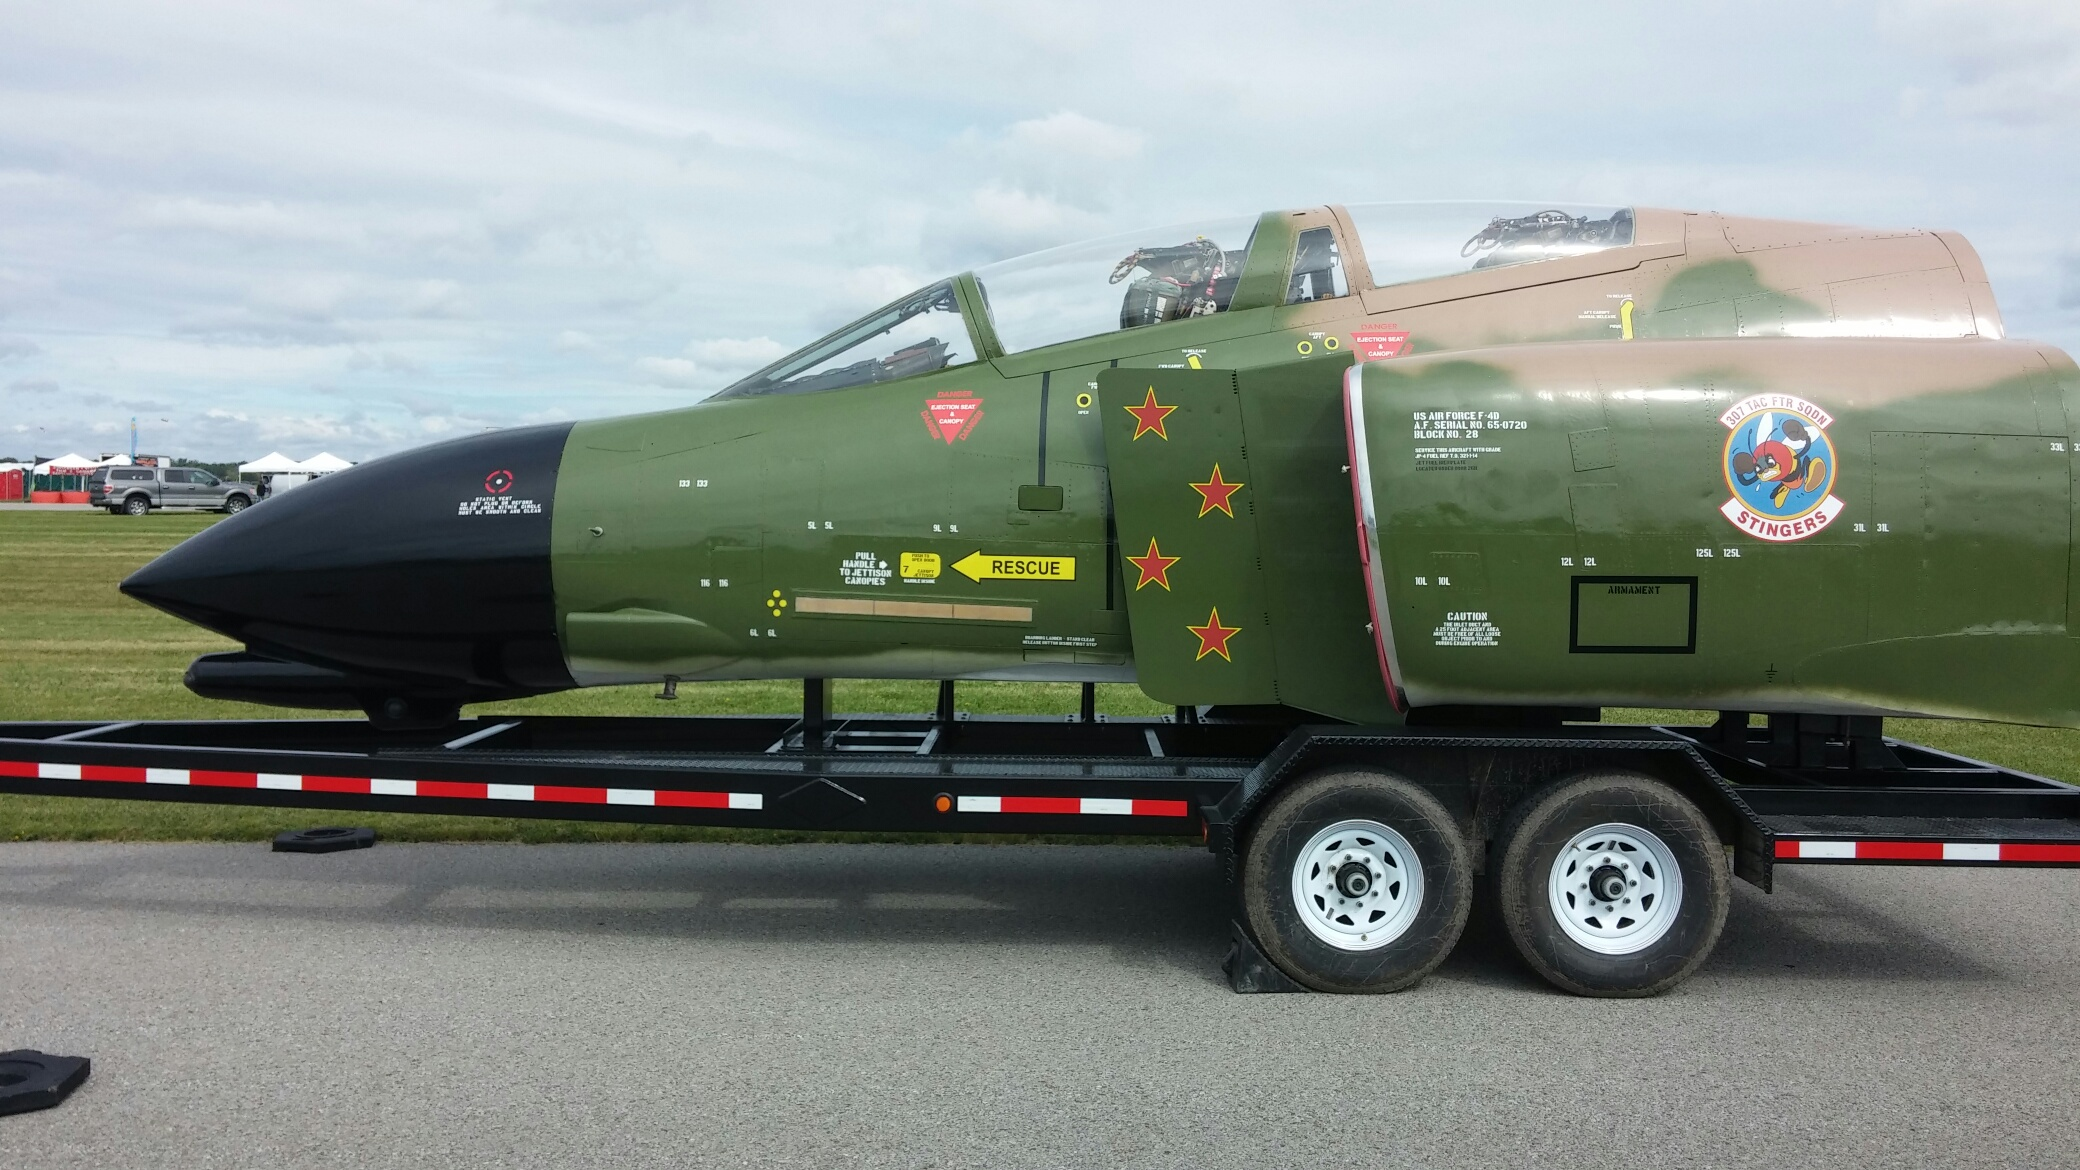 David Garbe's F-4D Phantom II cockpit on its specialized 30' transport trailer. (photo via David Garbe)